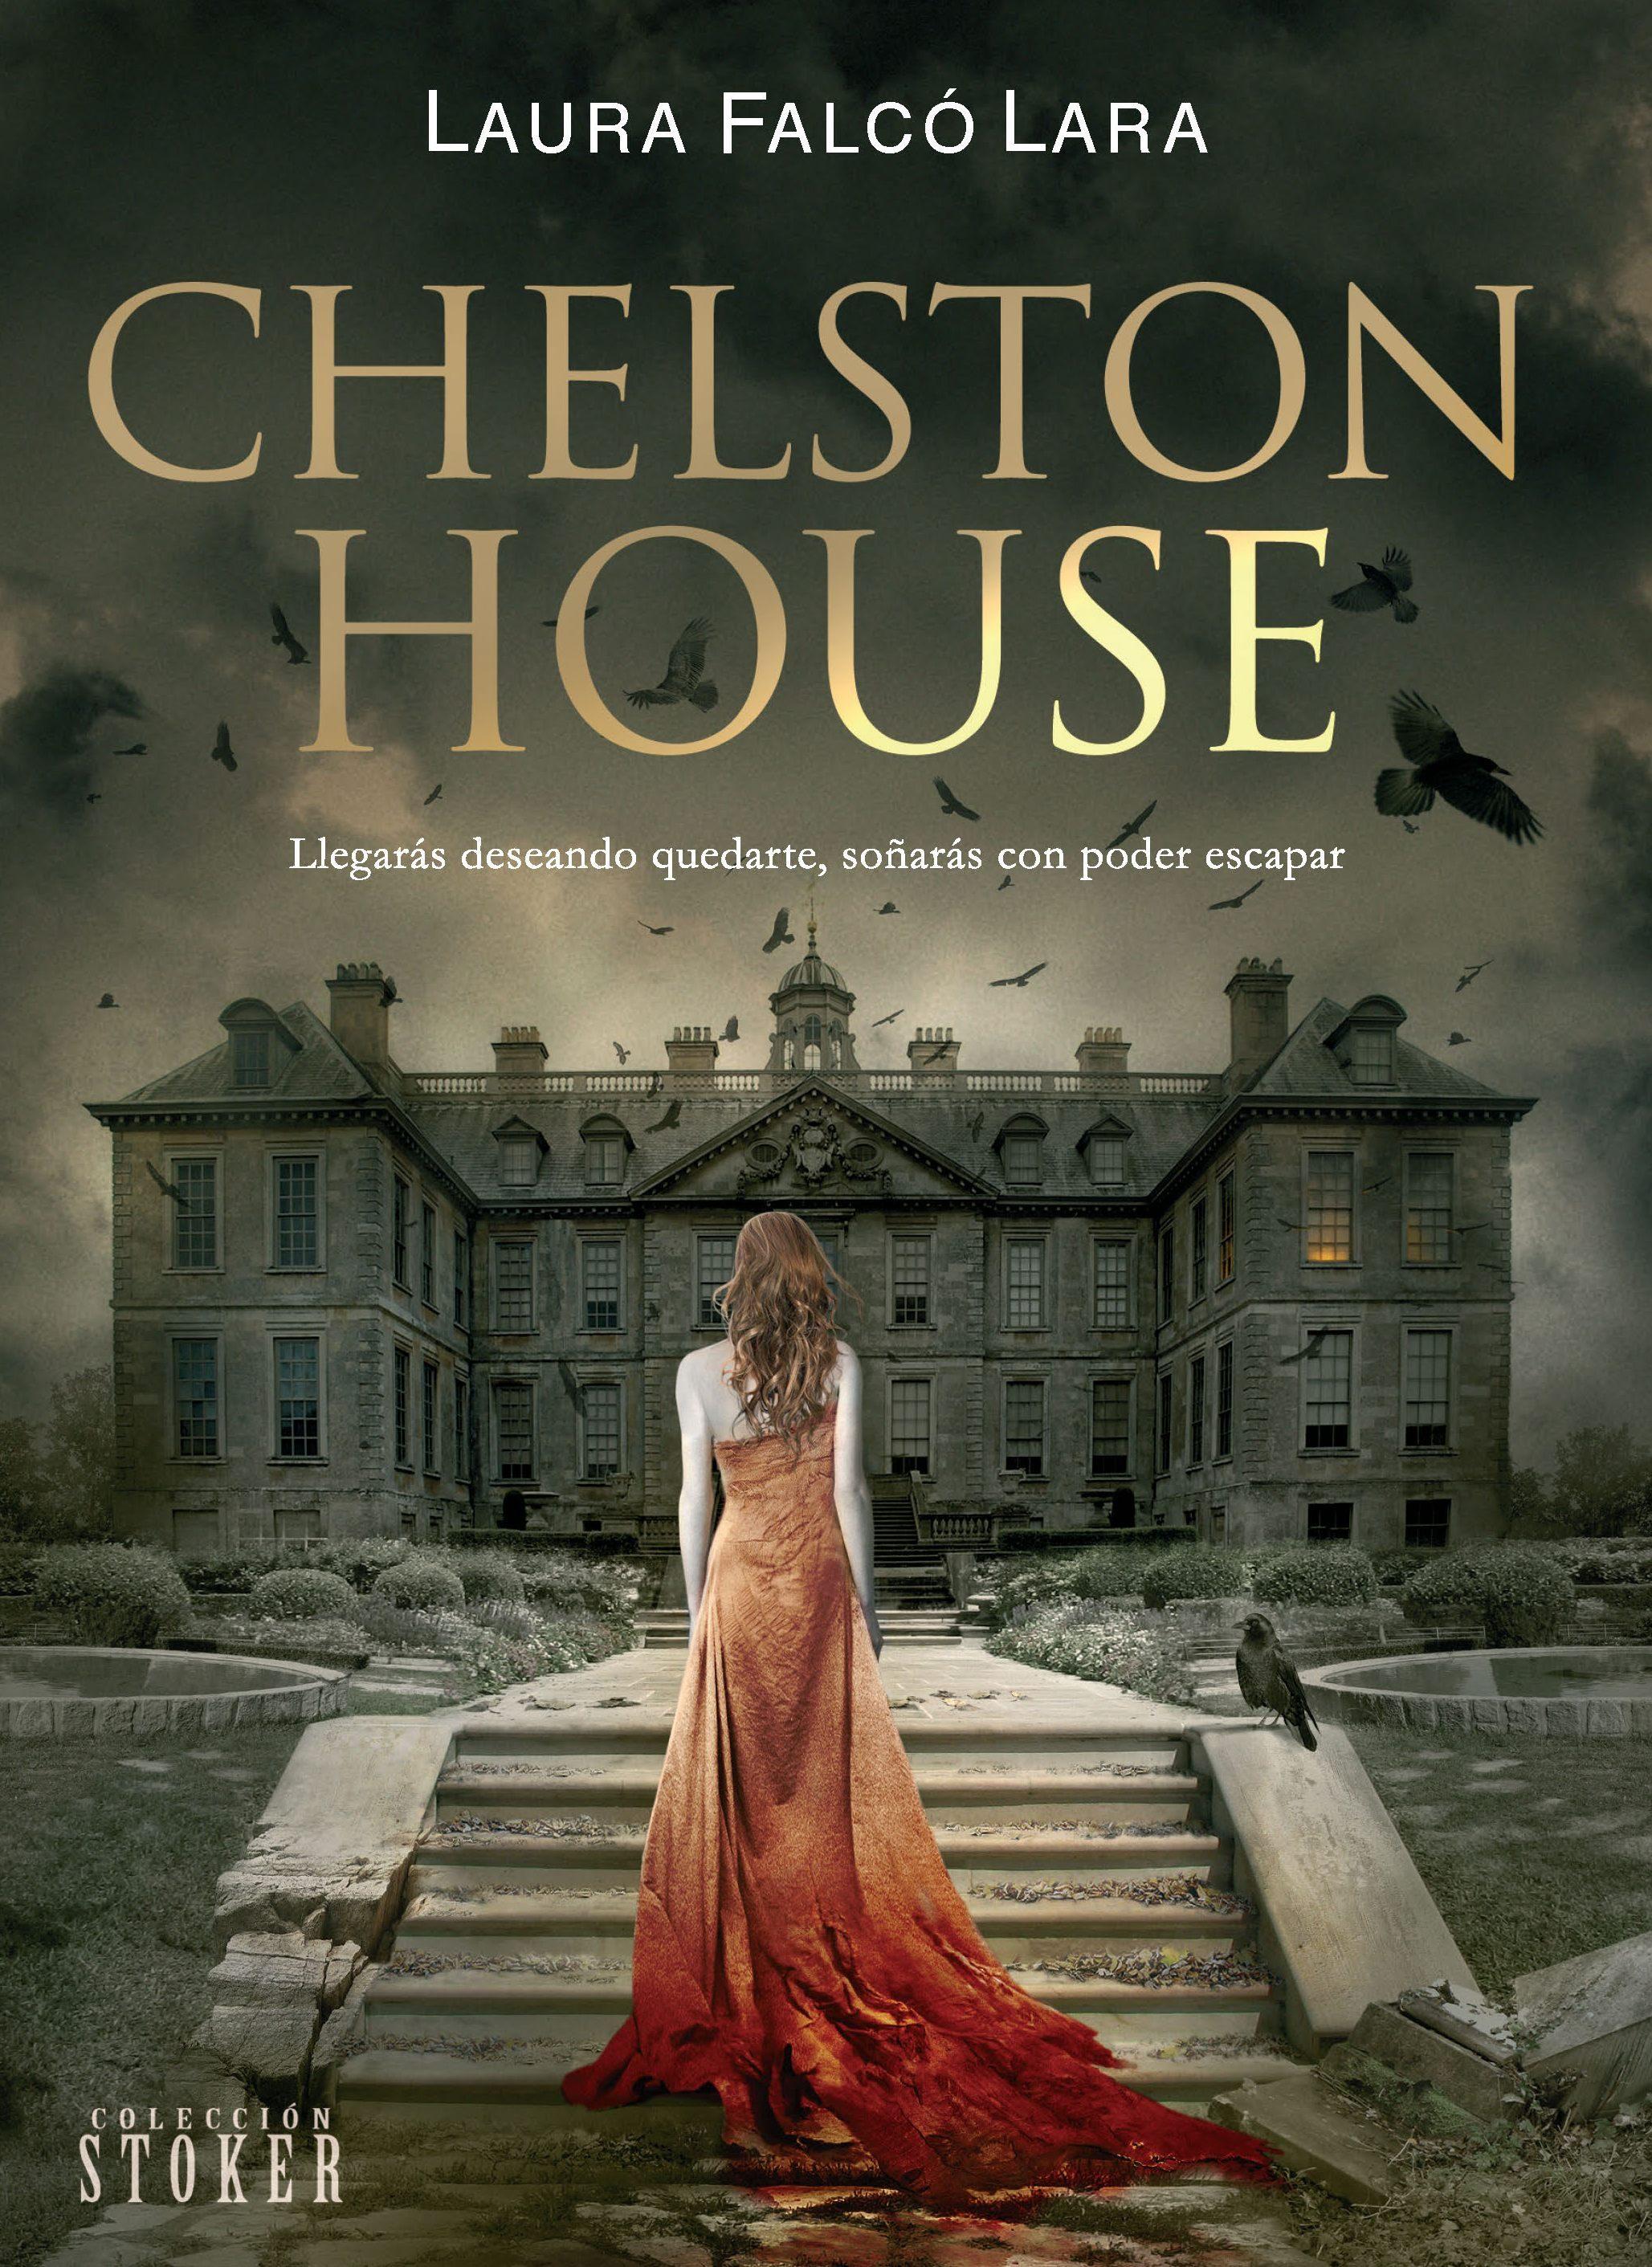 Chelston House - Laura Falcó Lara 9788415932307